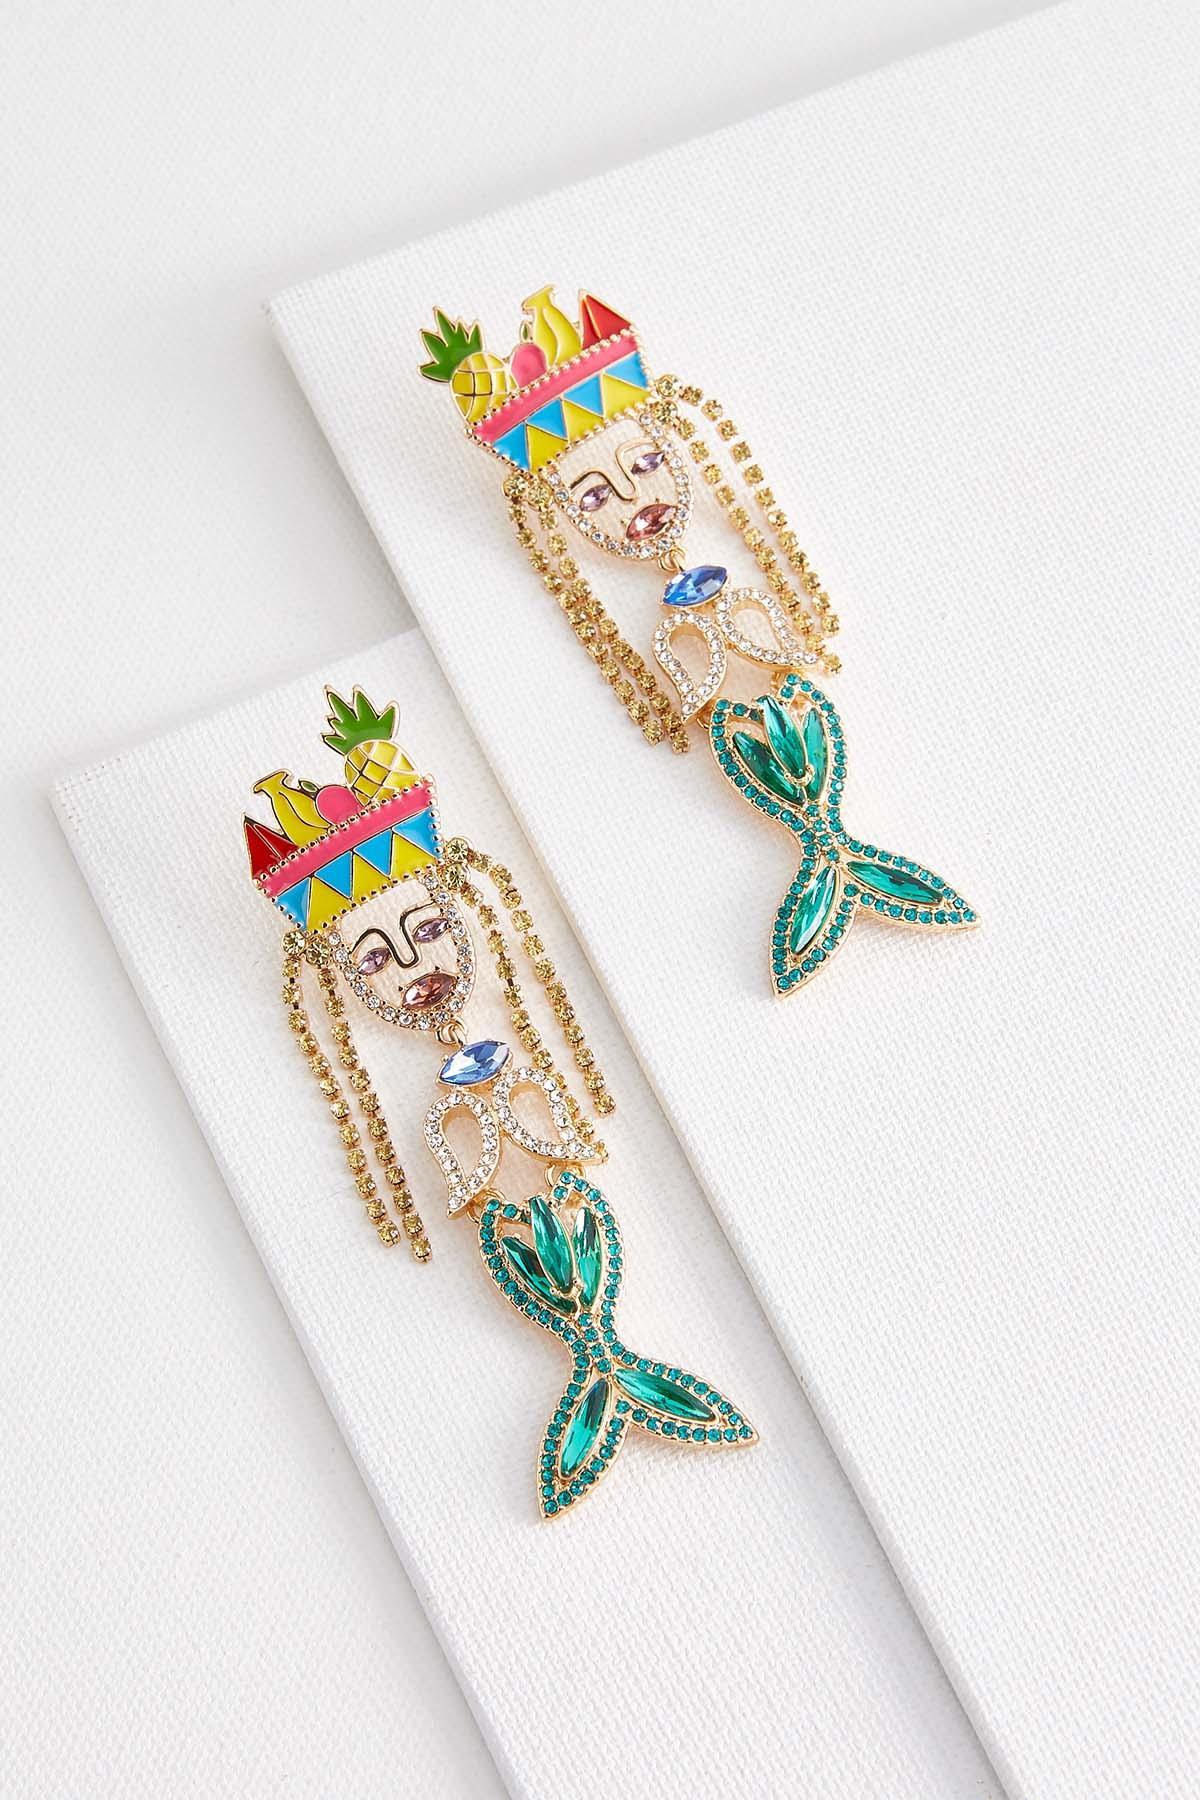 Jeweled Mermaid Earrings